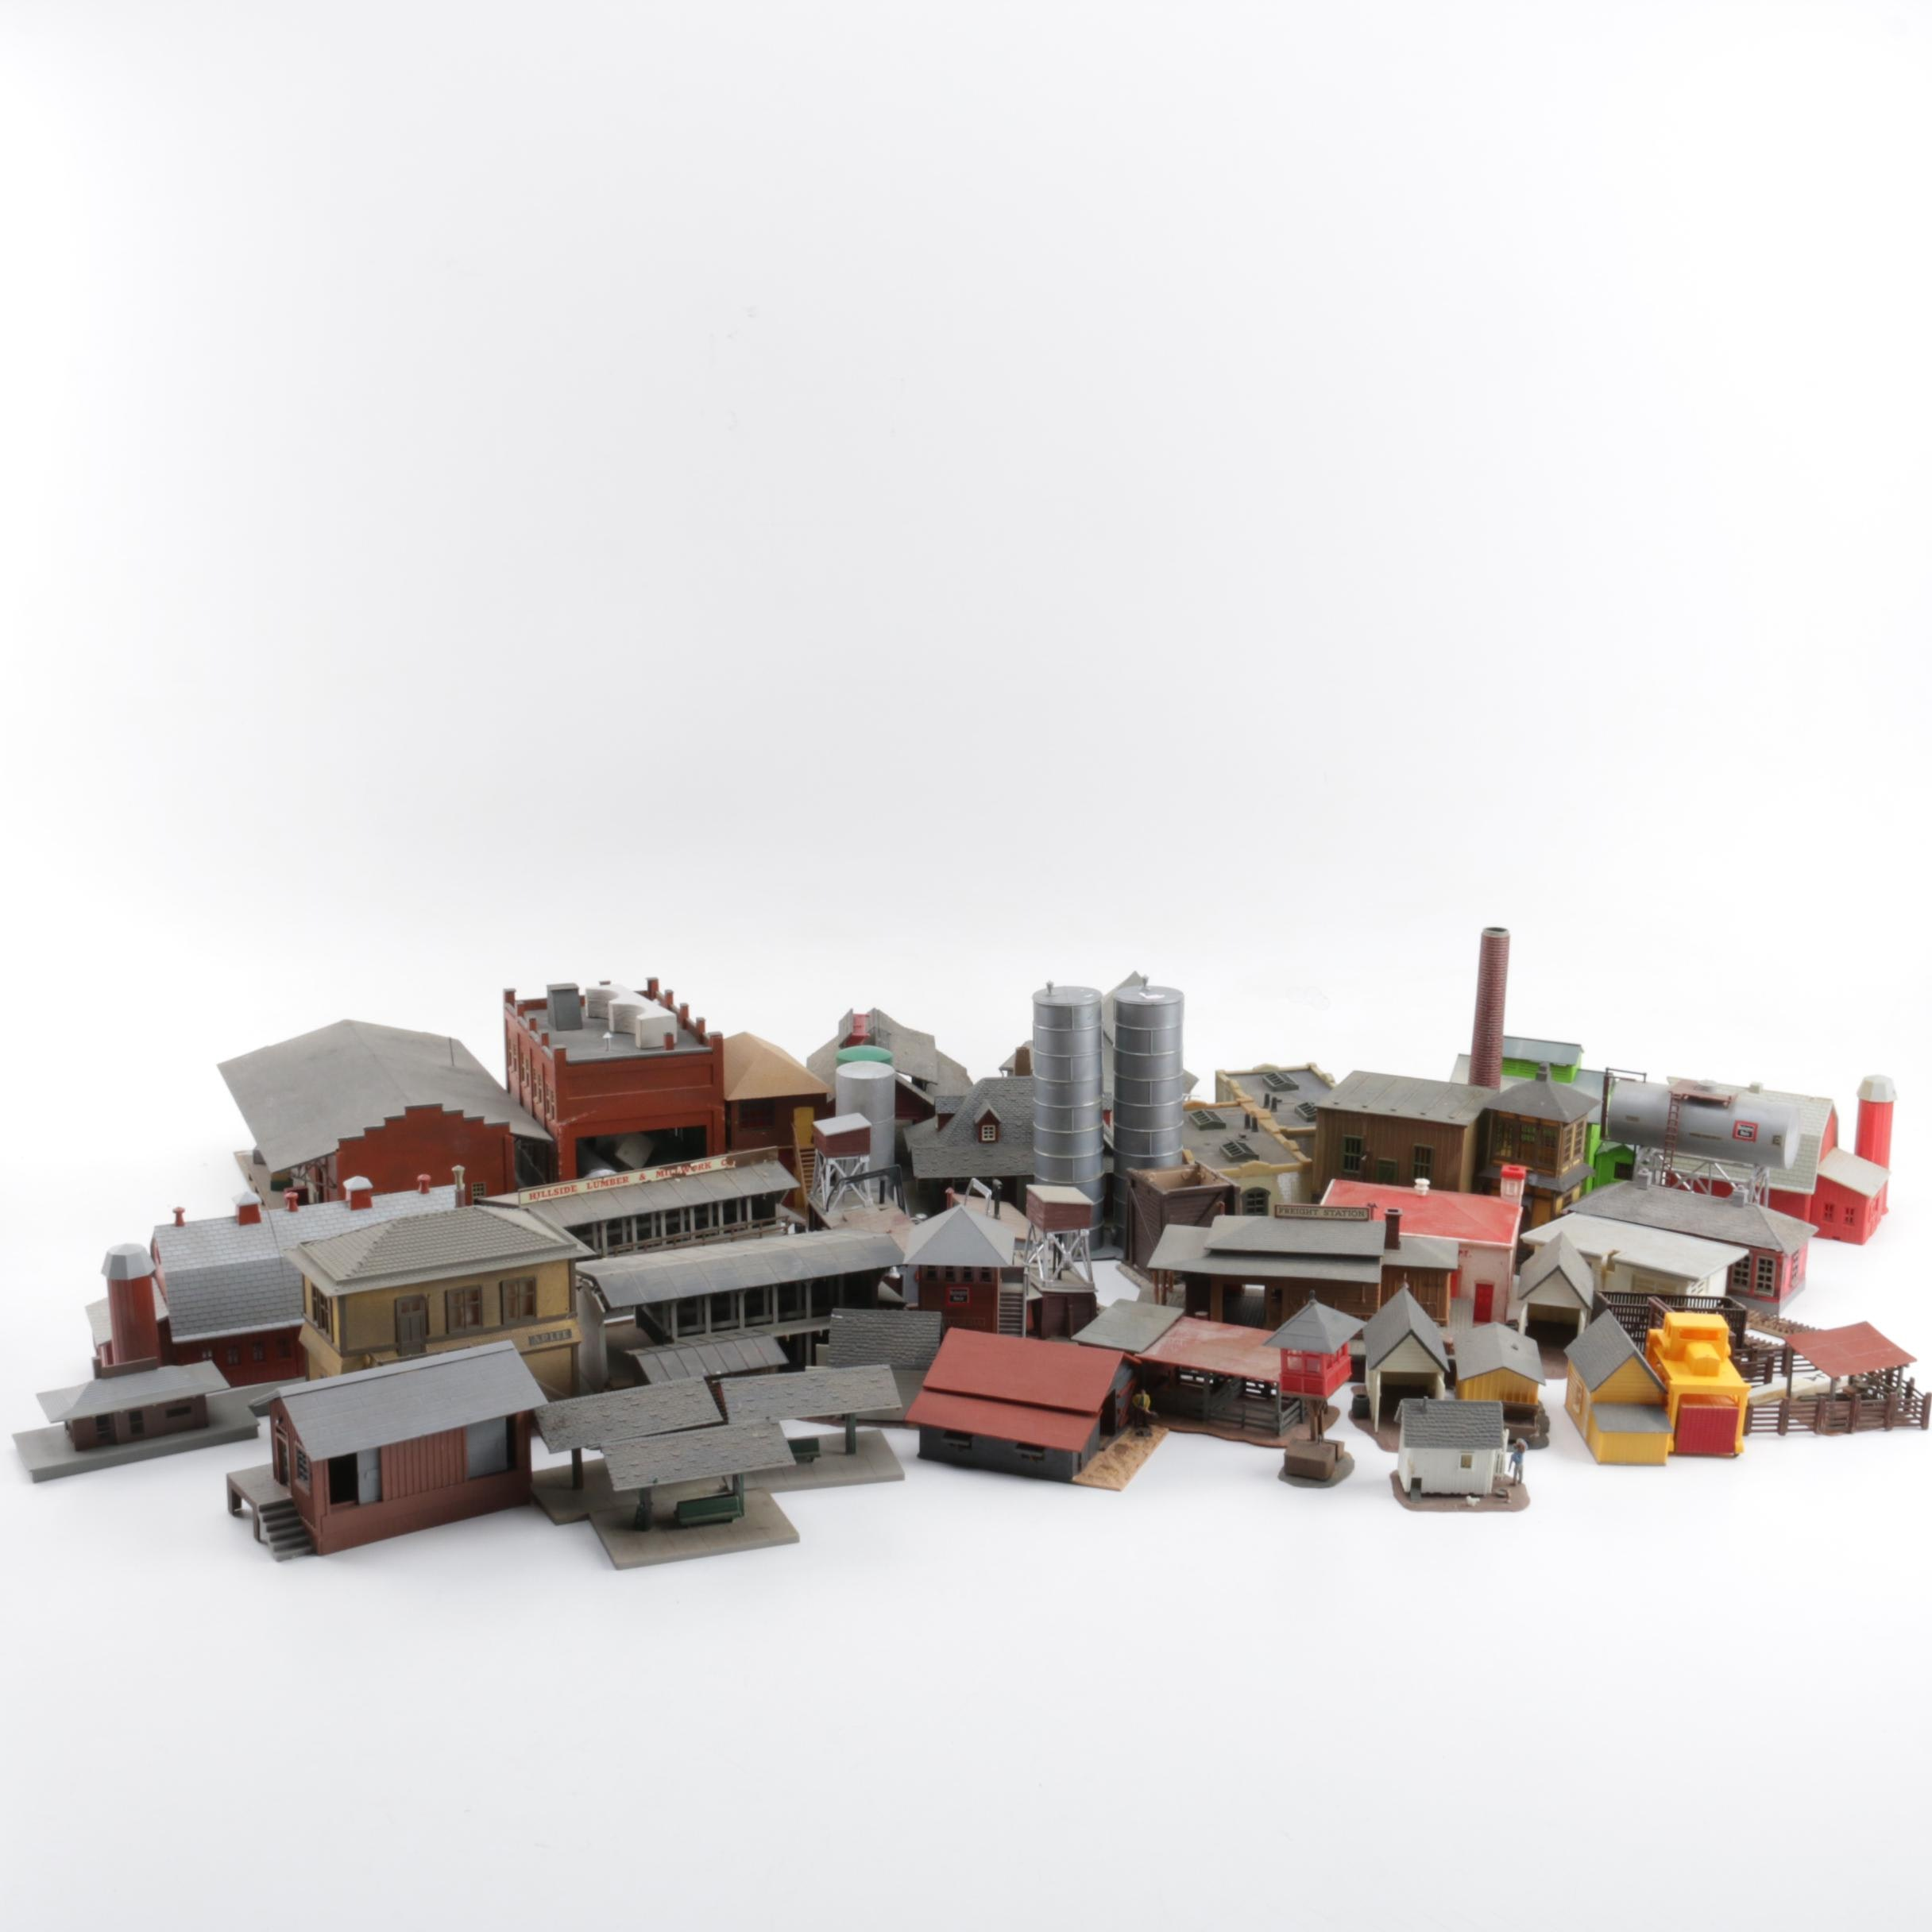 Assortment of Landscape Buildings for Model Railroads